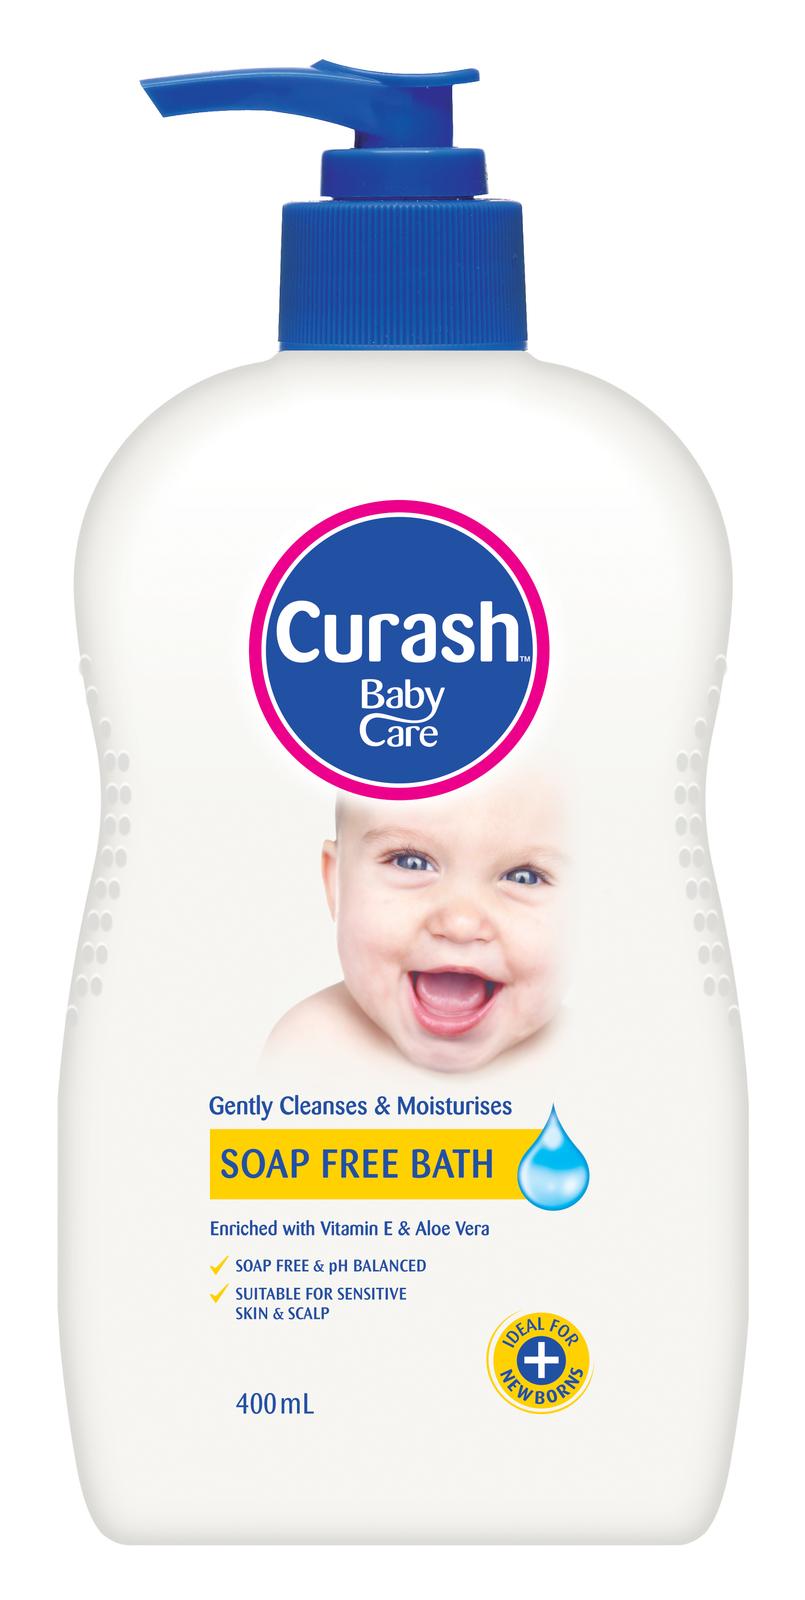 Curash Moisturising Soap Free Bath - 400ml image